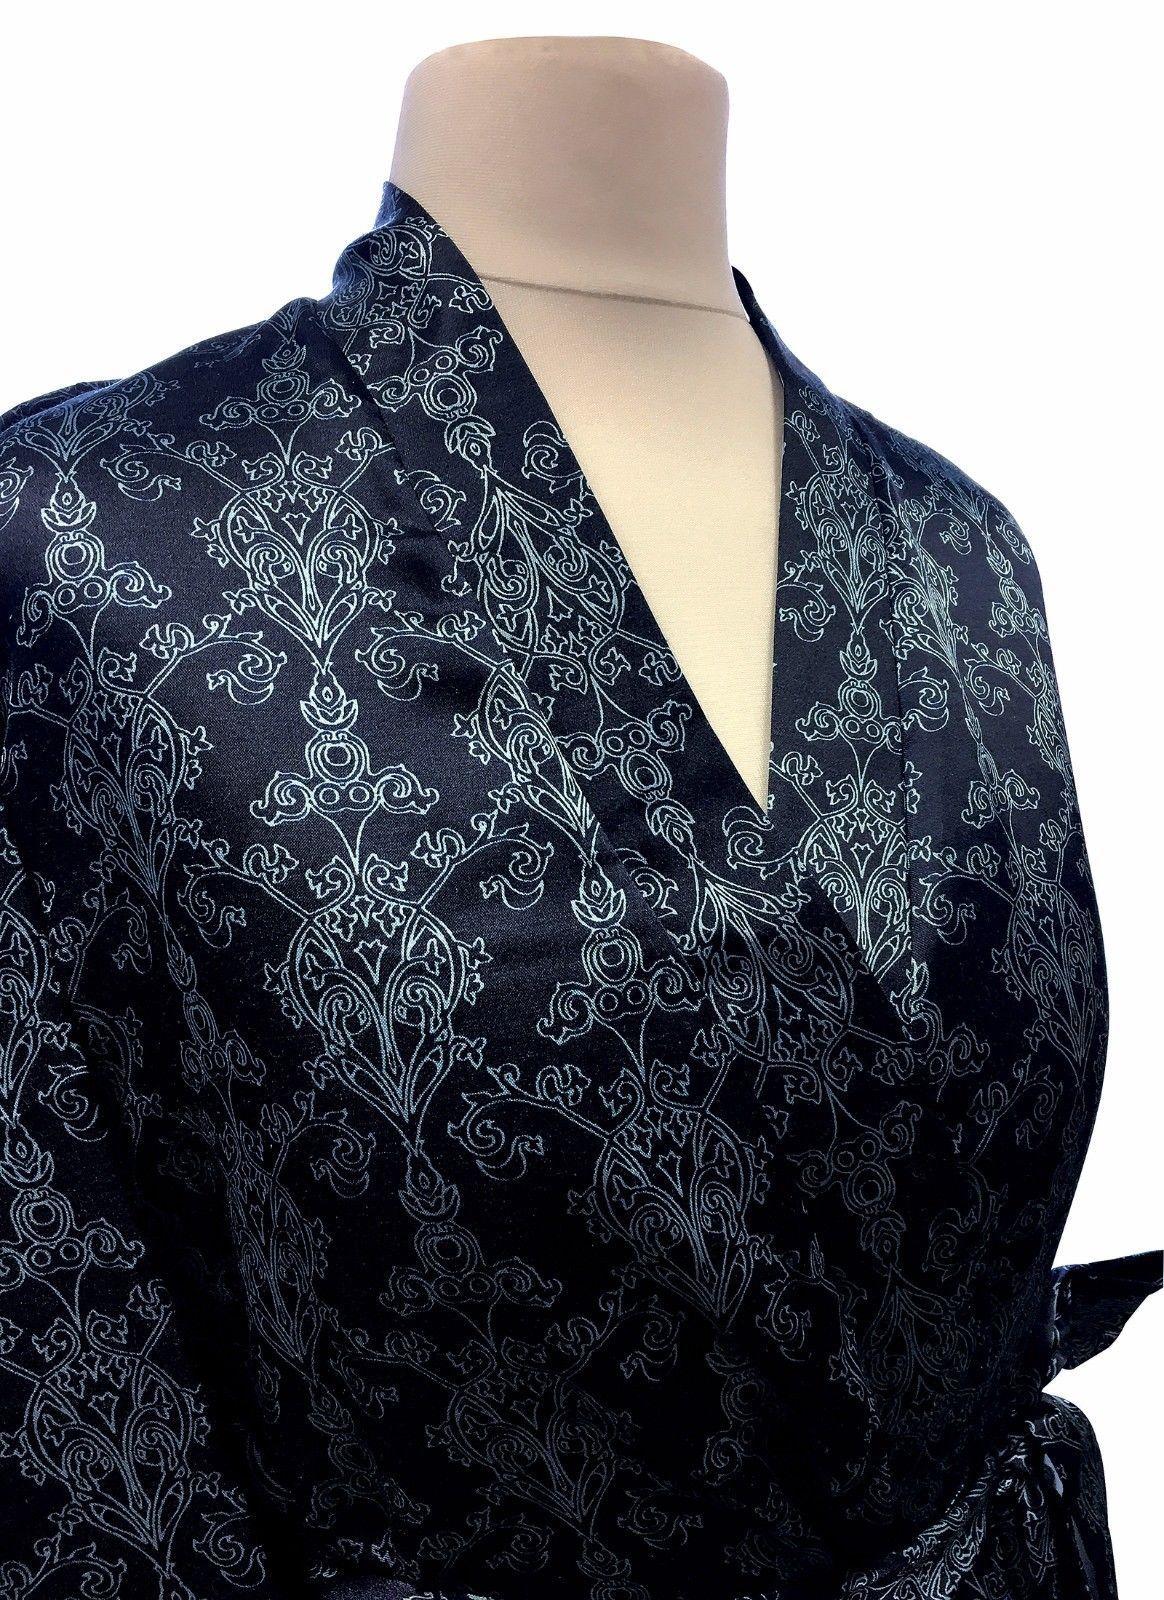 Womens Vintage Filigree Pattern Long Lined Satin Robe Wrap Kimono Dressing  Gown 8a7d4eaea